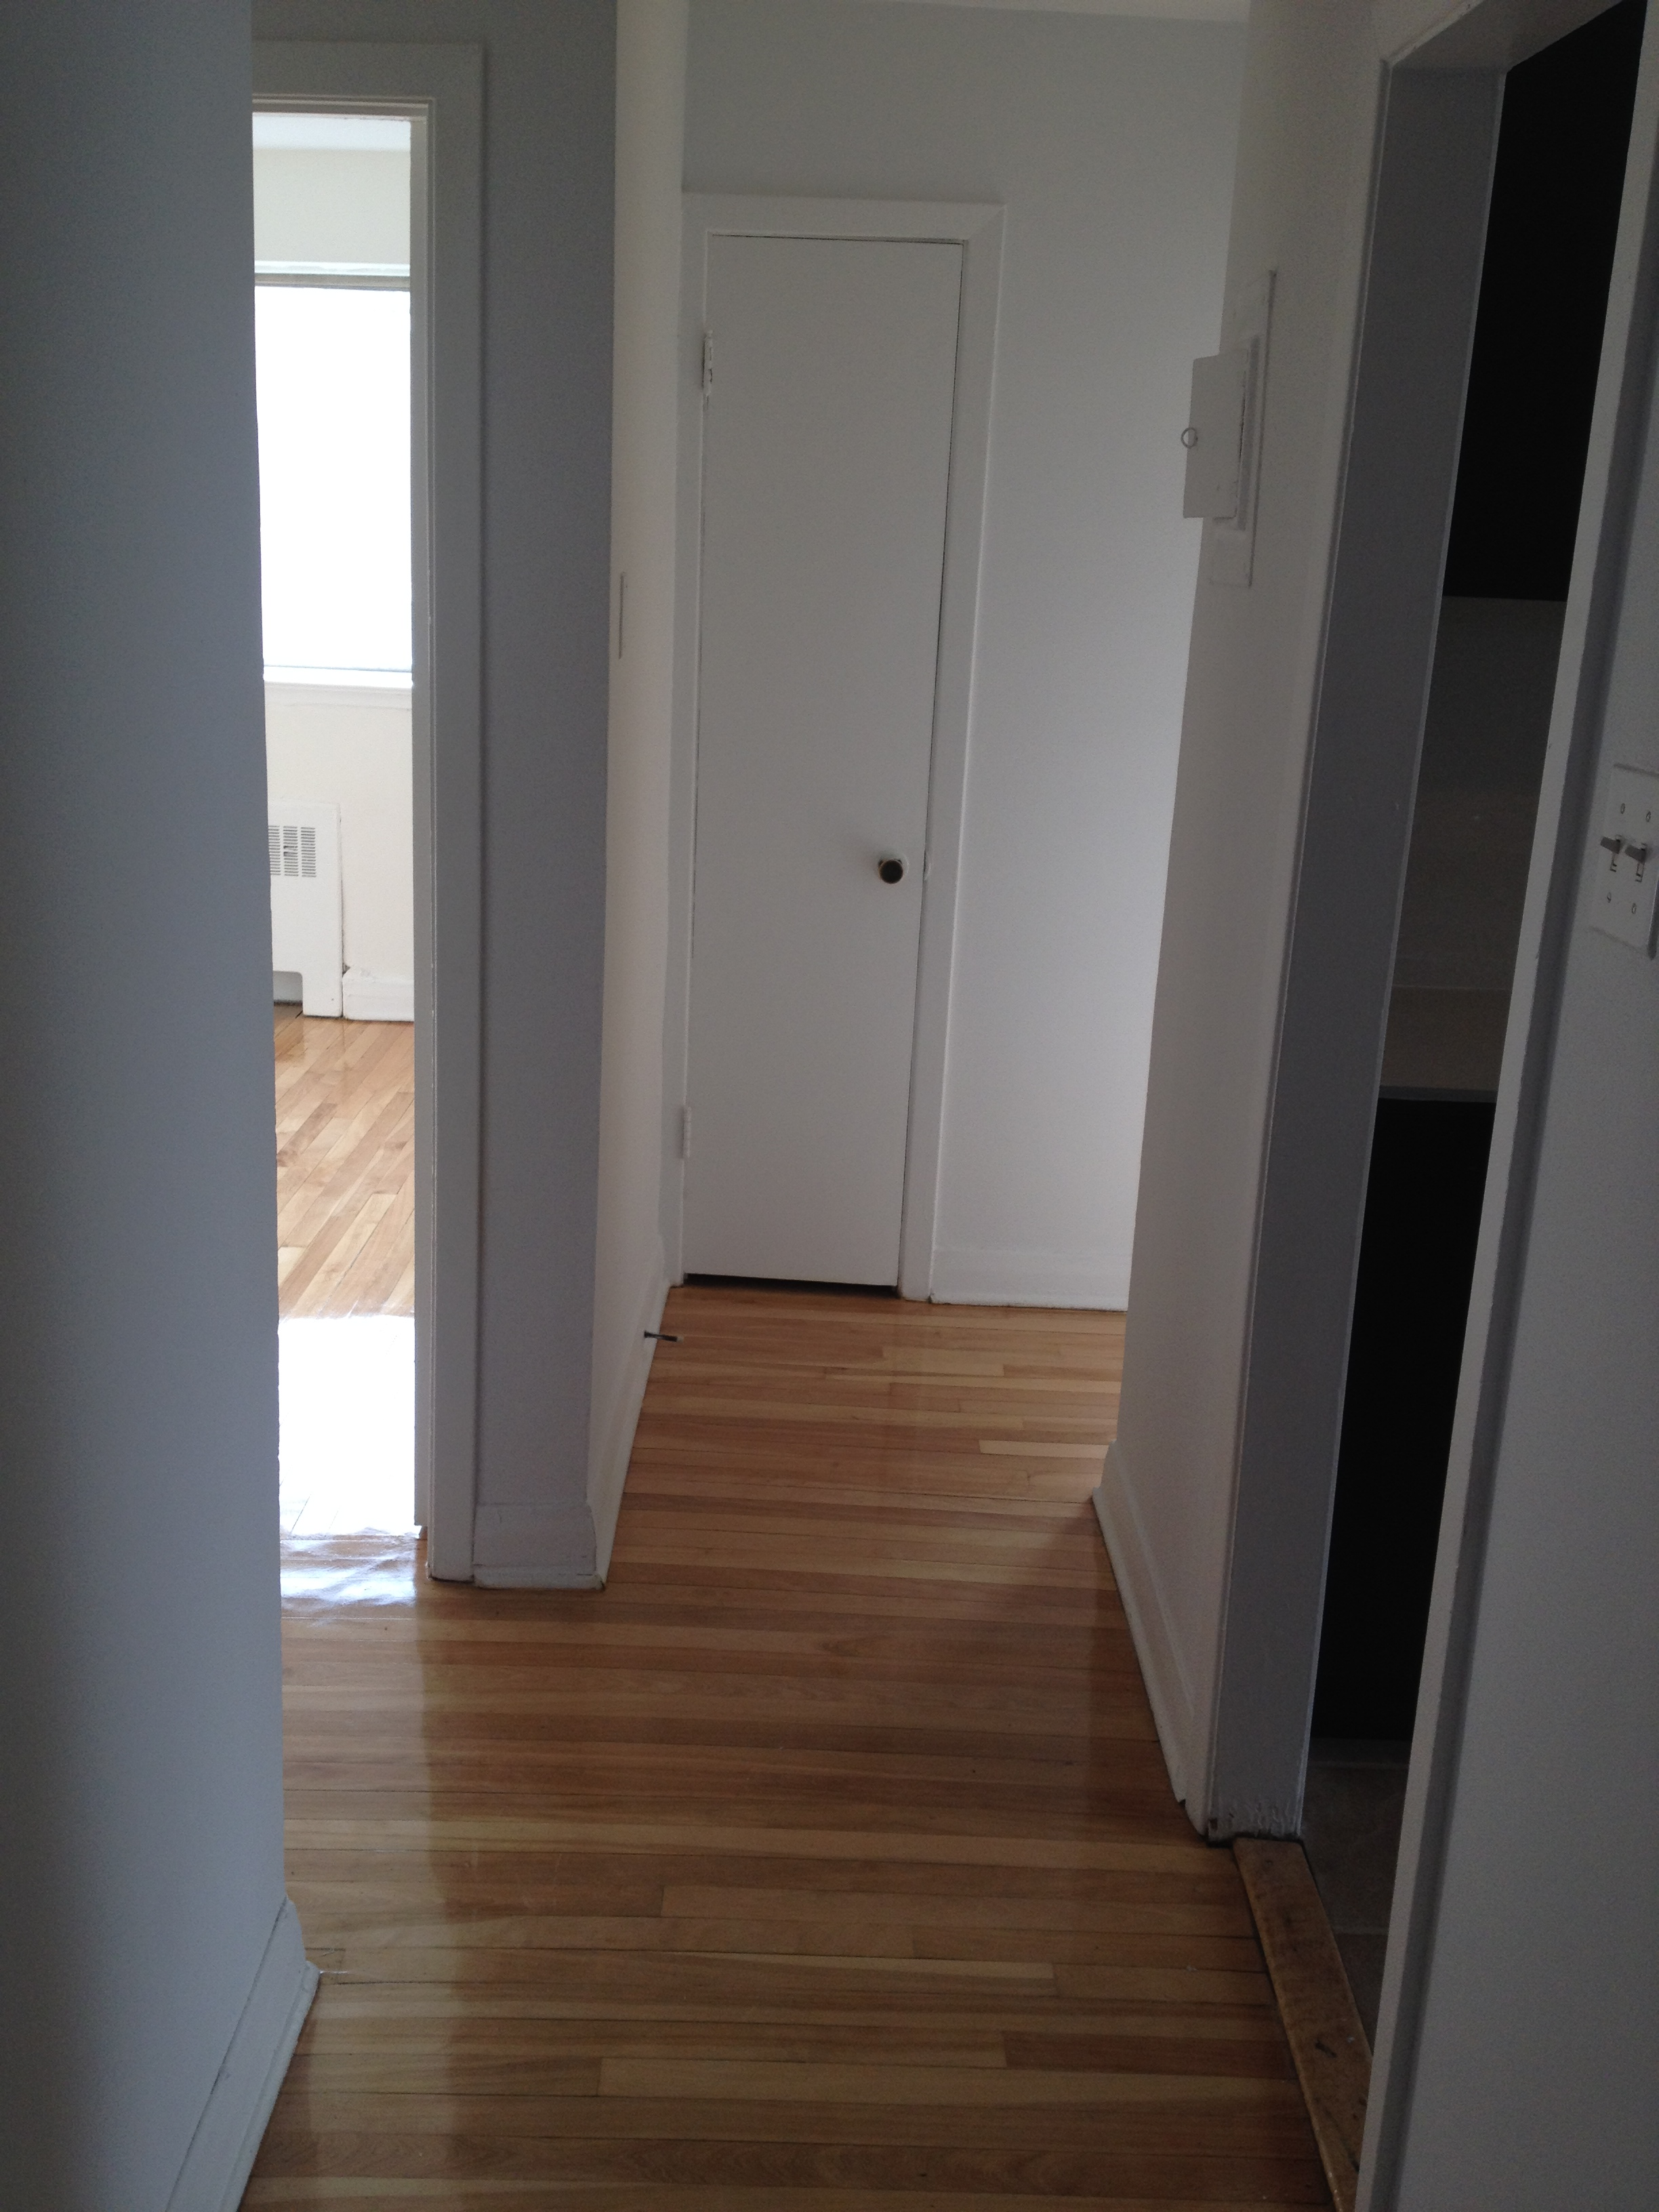 2 bedroom Apartments for rent in Cote-des-Neiges at 2615-2625 Kent - Photo 01 - RentersPages – L20674